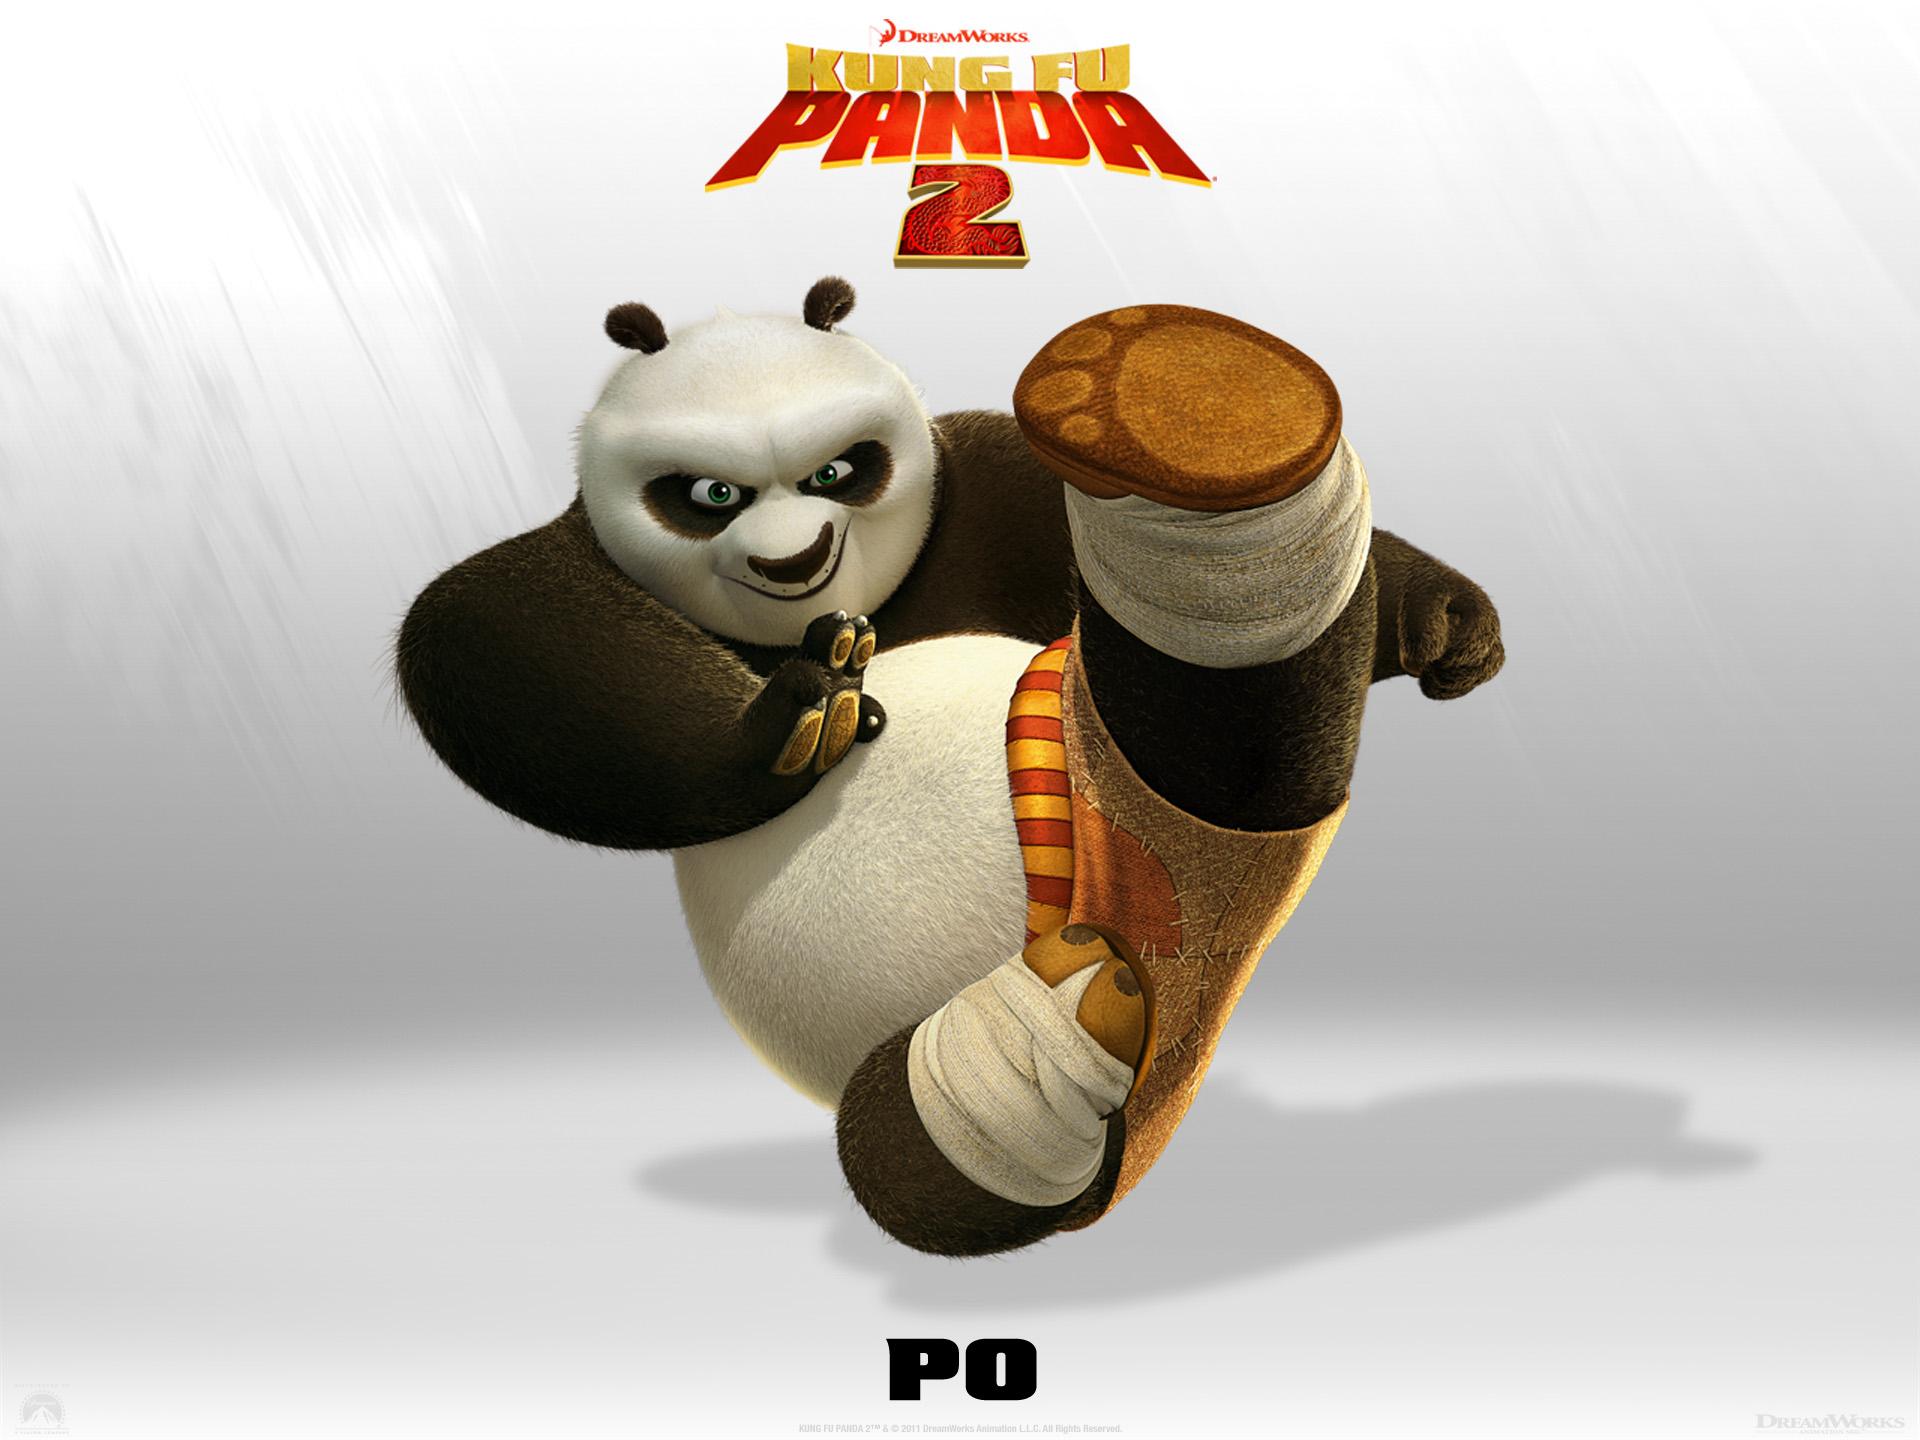 Wallpaper Kung Fu PANDA 2 PO Cinema Video